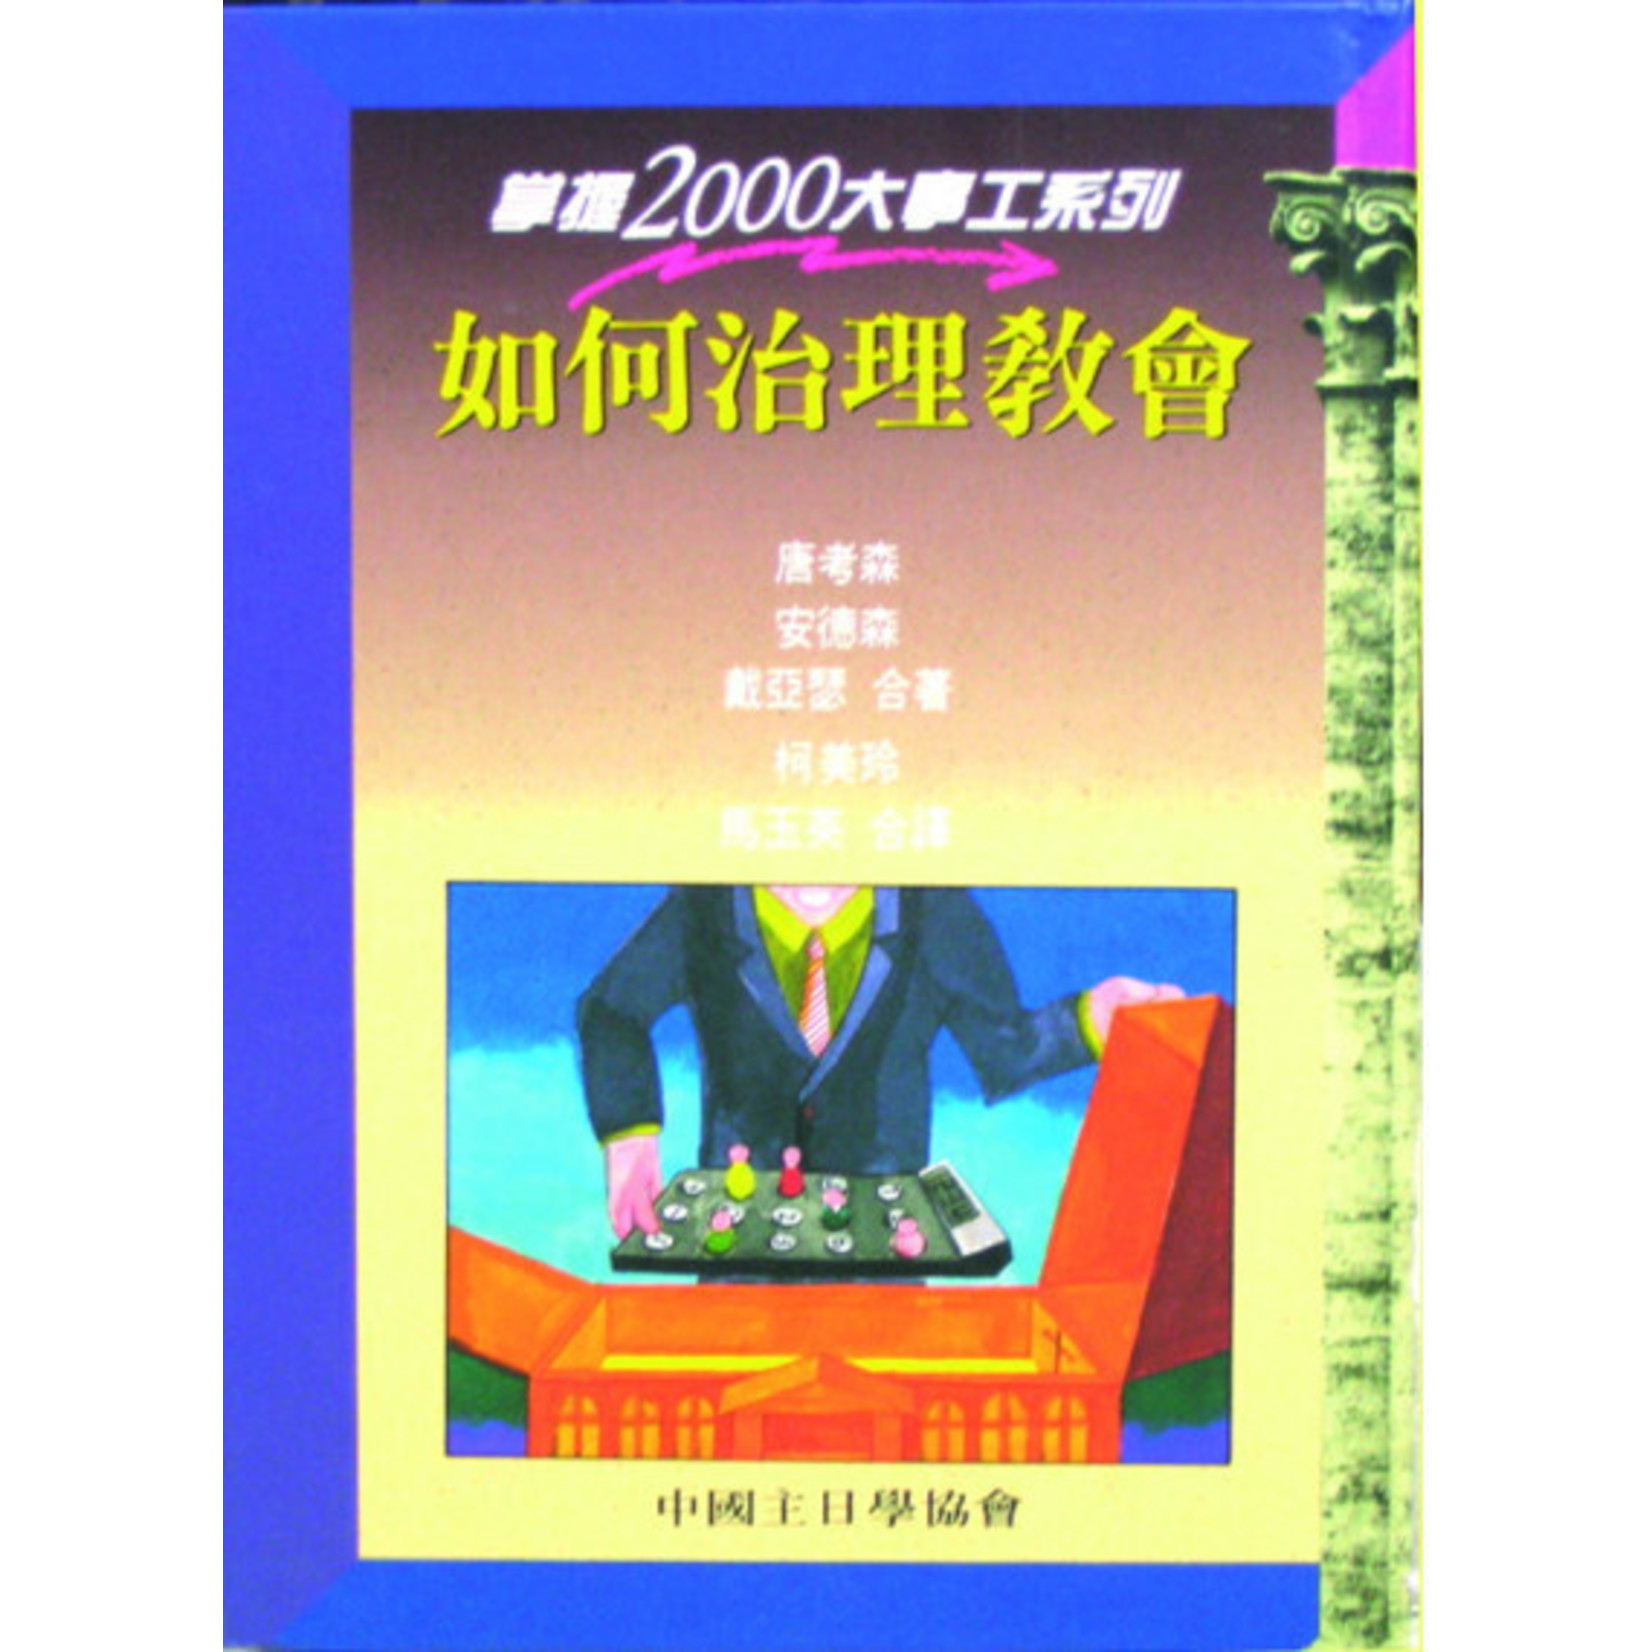 中國主日學協會 China Sunday School Association 如何治理教會(掌握2000大事工系列) Mastering Church Management